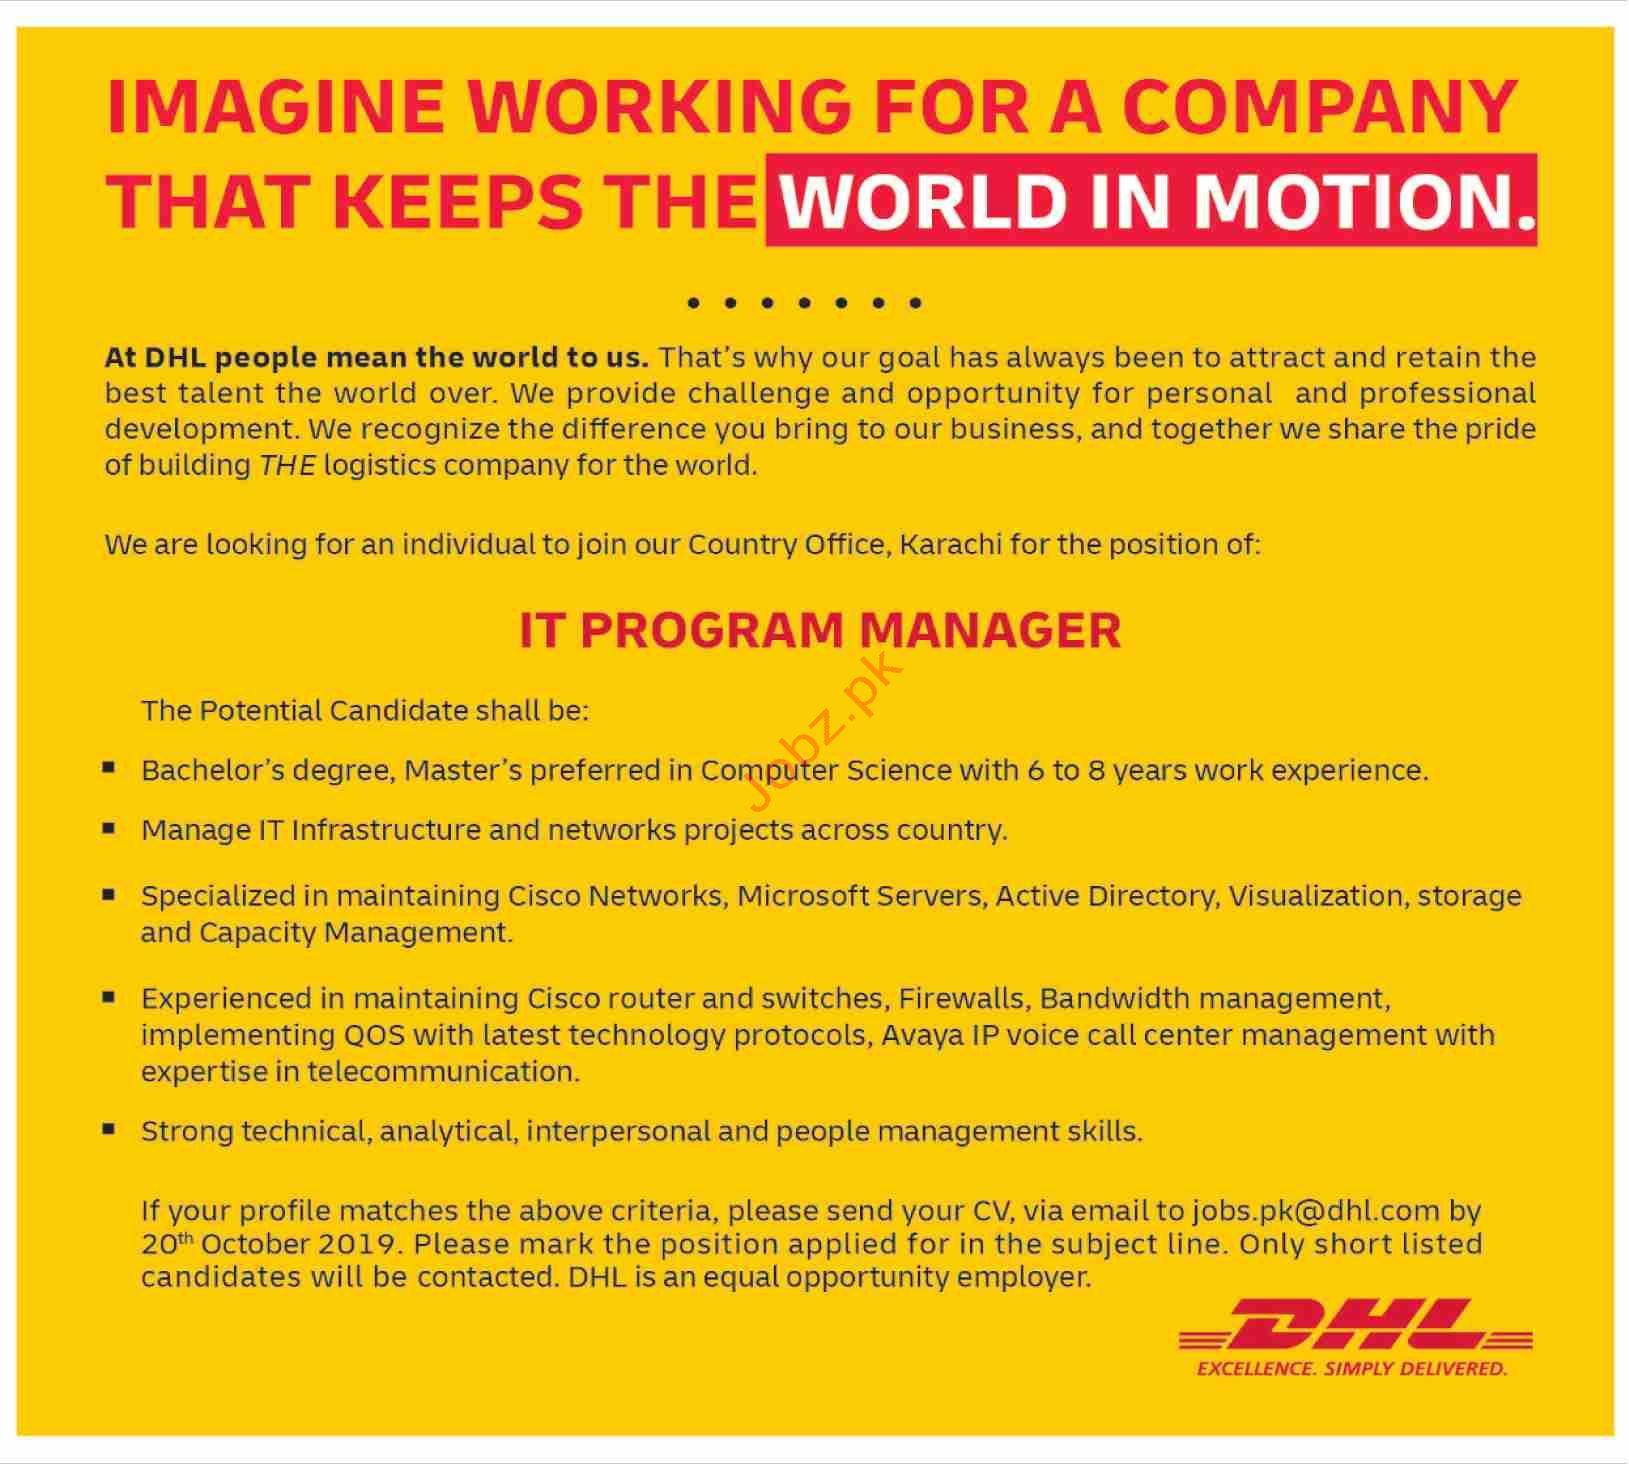 IT Program Manager Jobs in Karachi